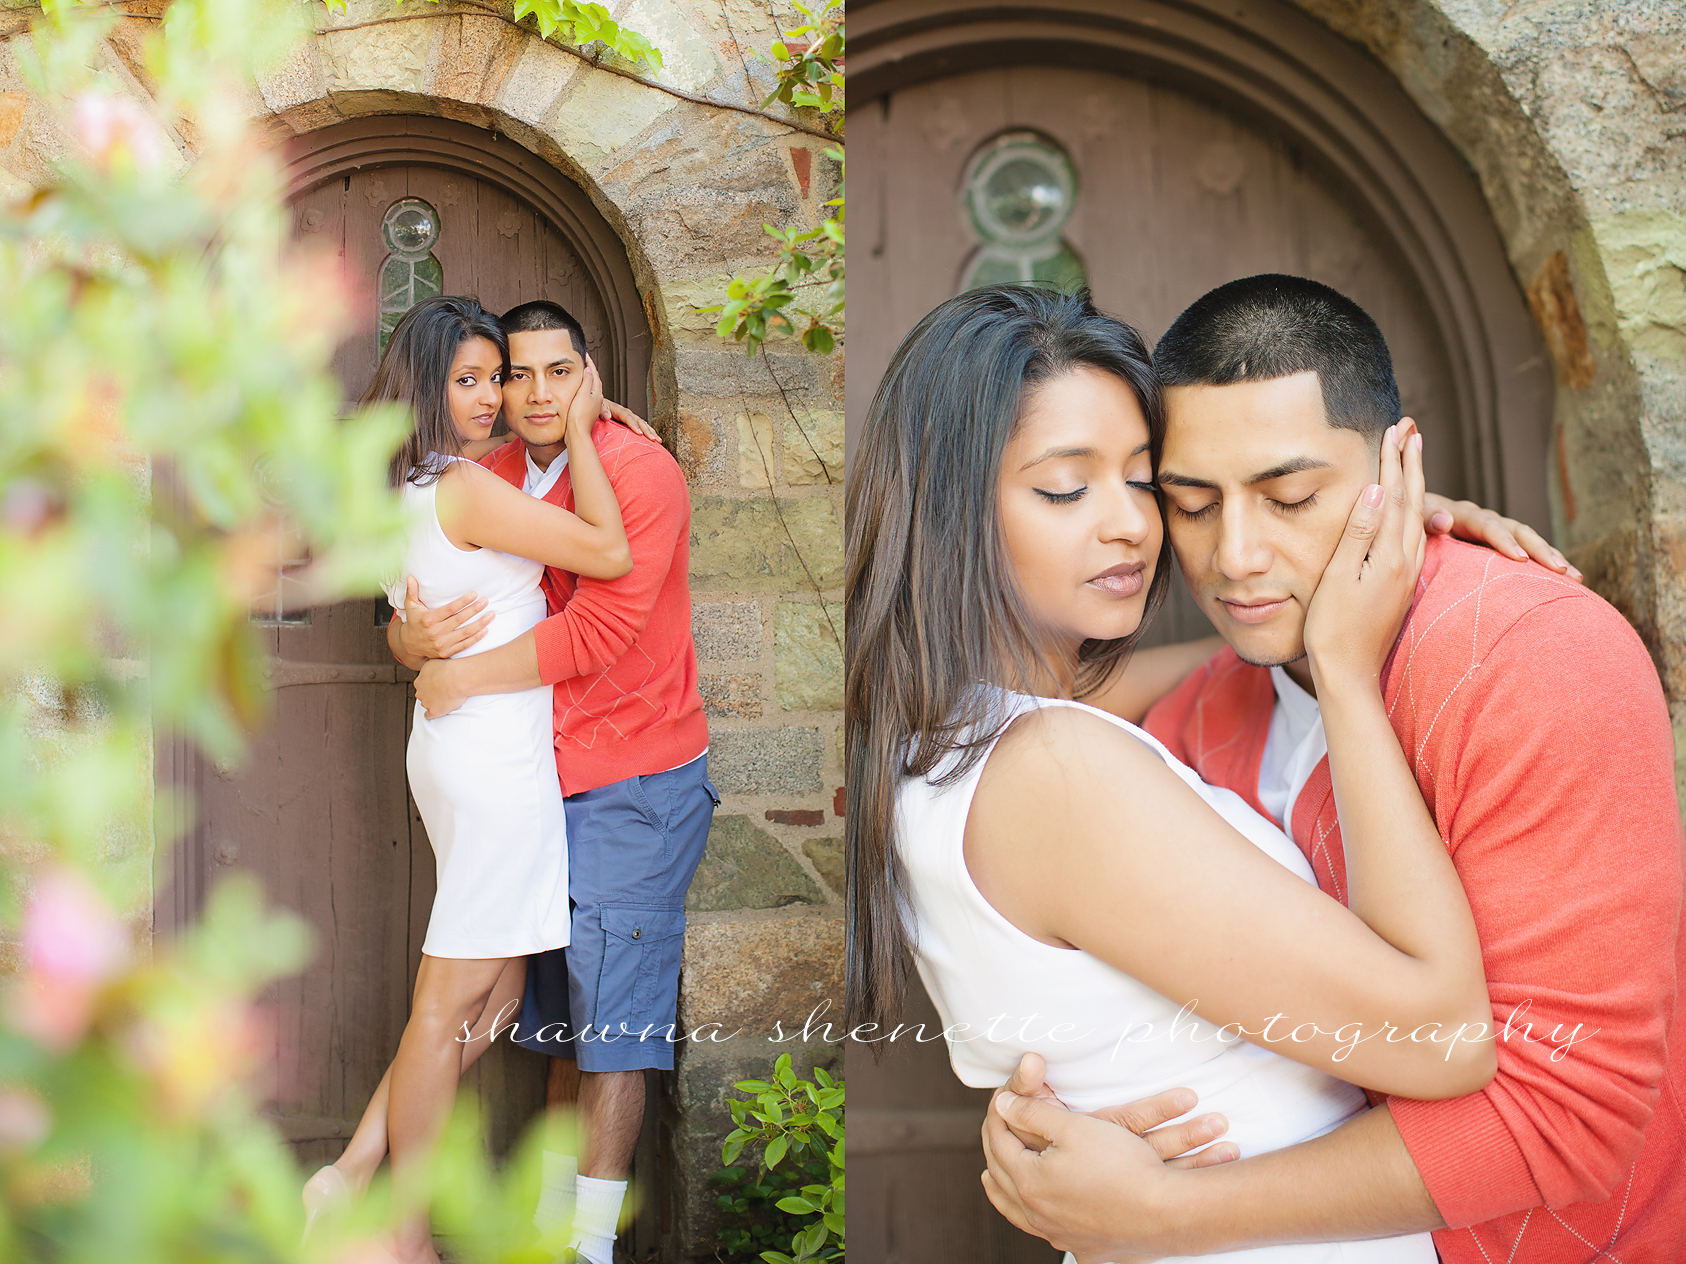 worcester ma engagement photography millbury best photographer massachusetts photos